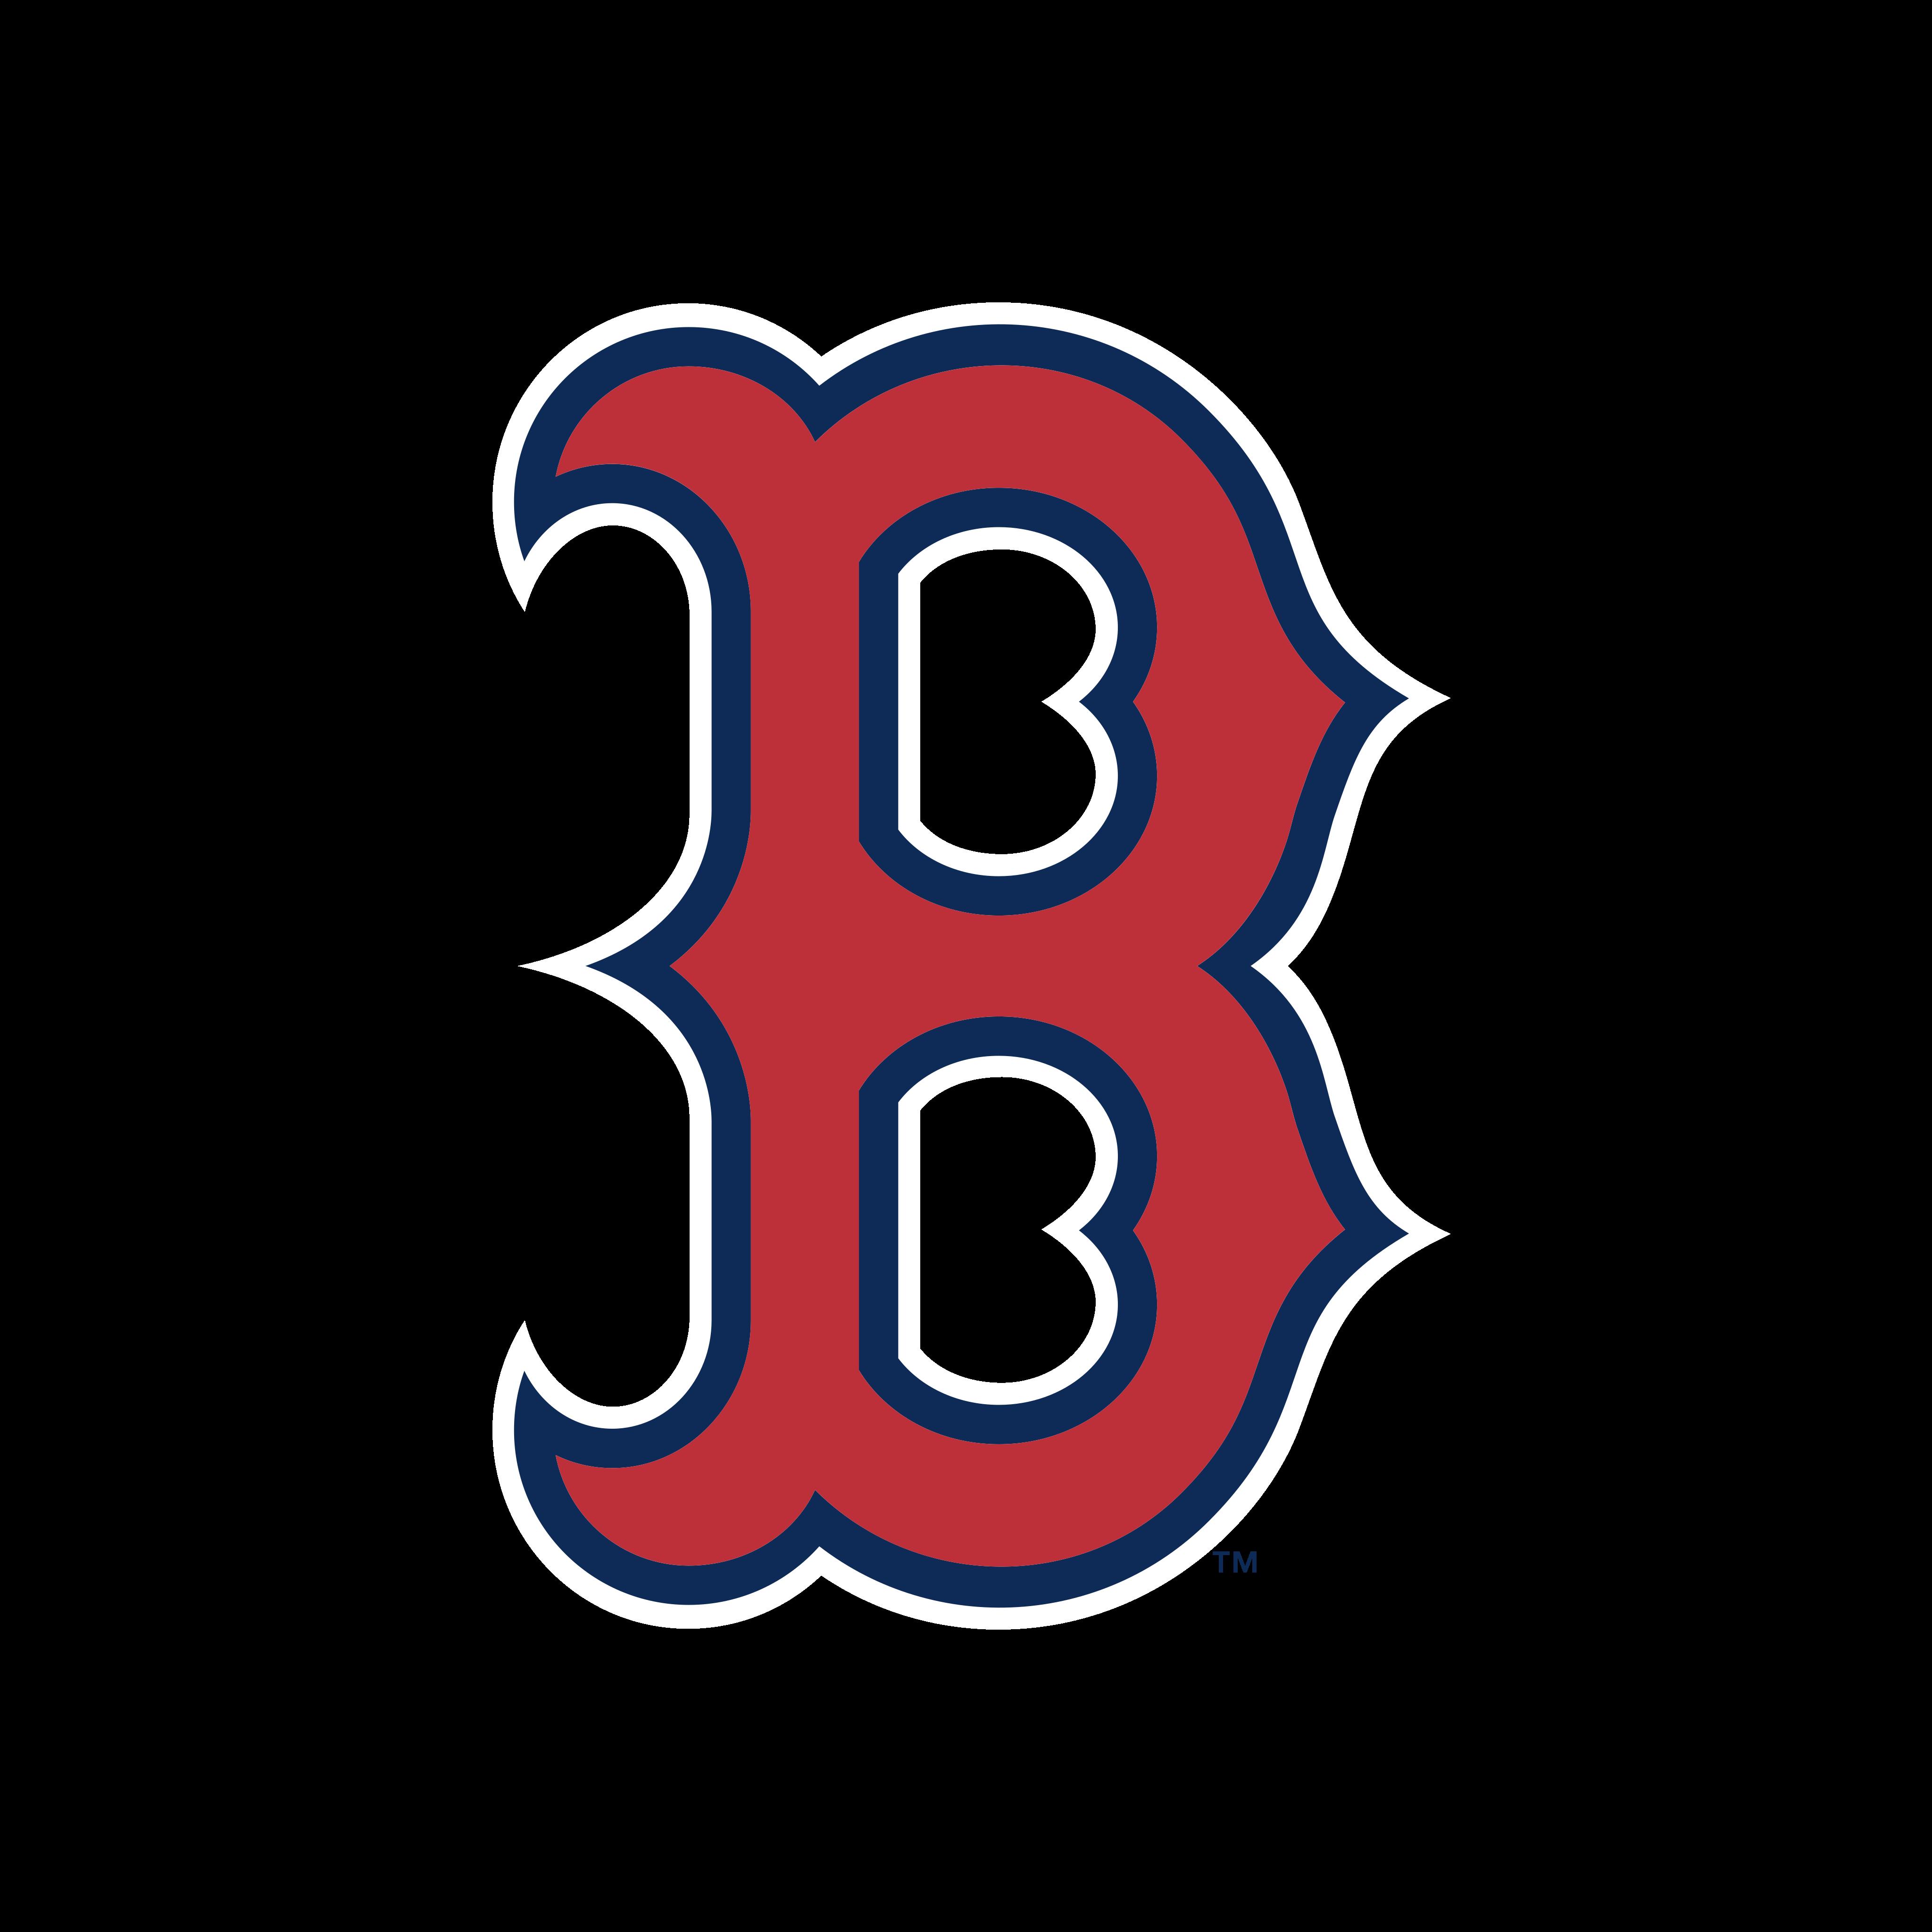 boston red sox logo 0 - Boston Red Sox Logo